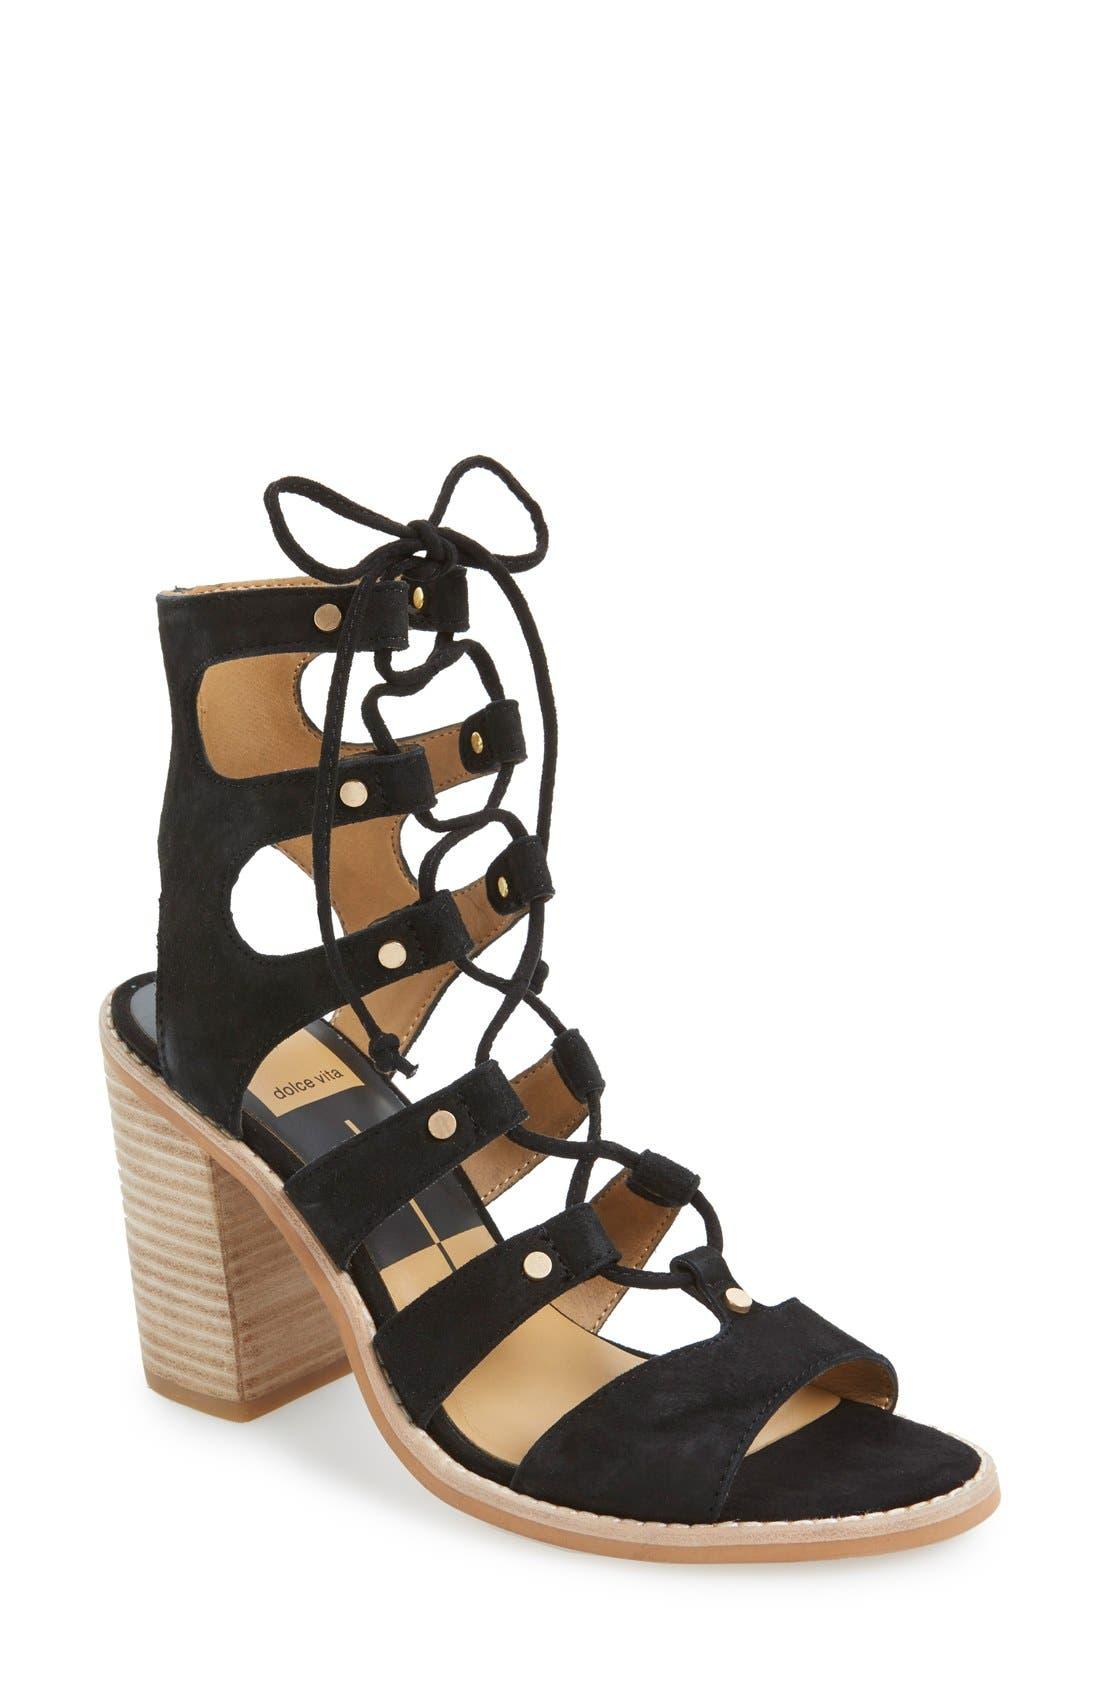 Main Image - Dolce Vita 'Lyndon' Lace-Up Sandal (Women)